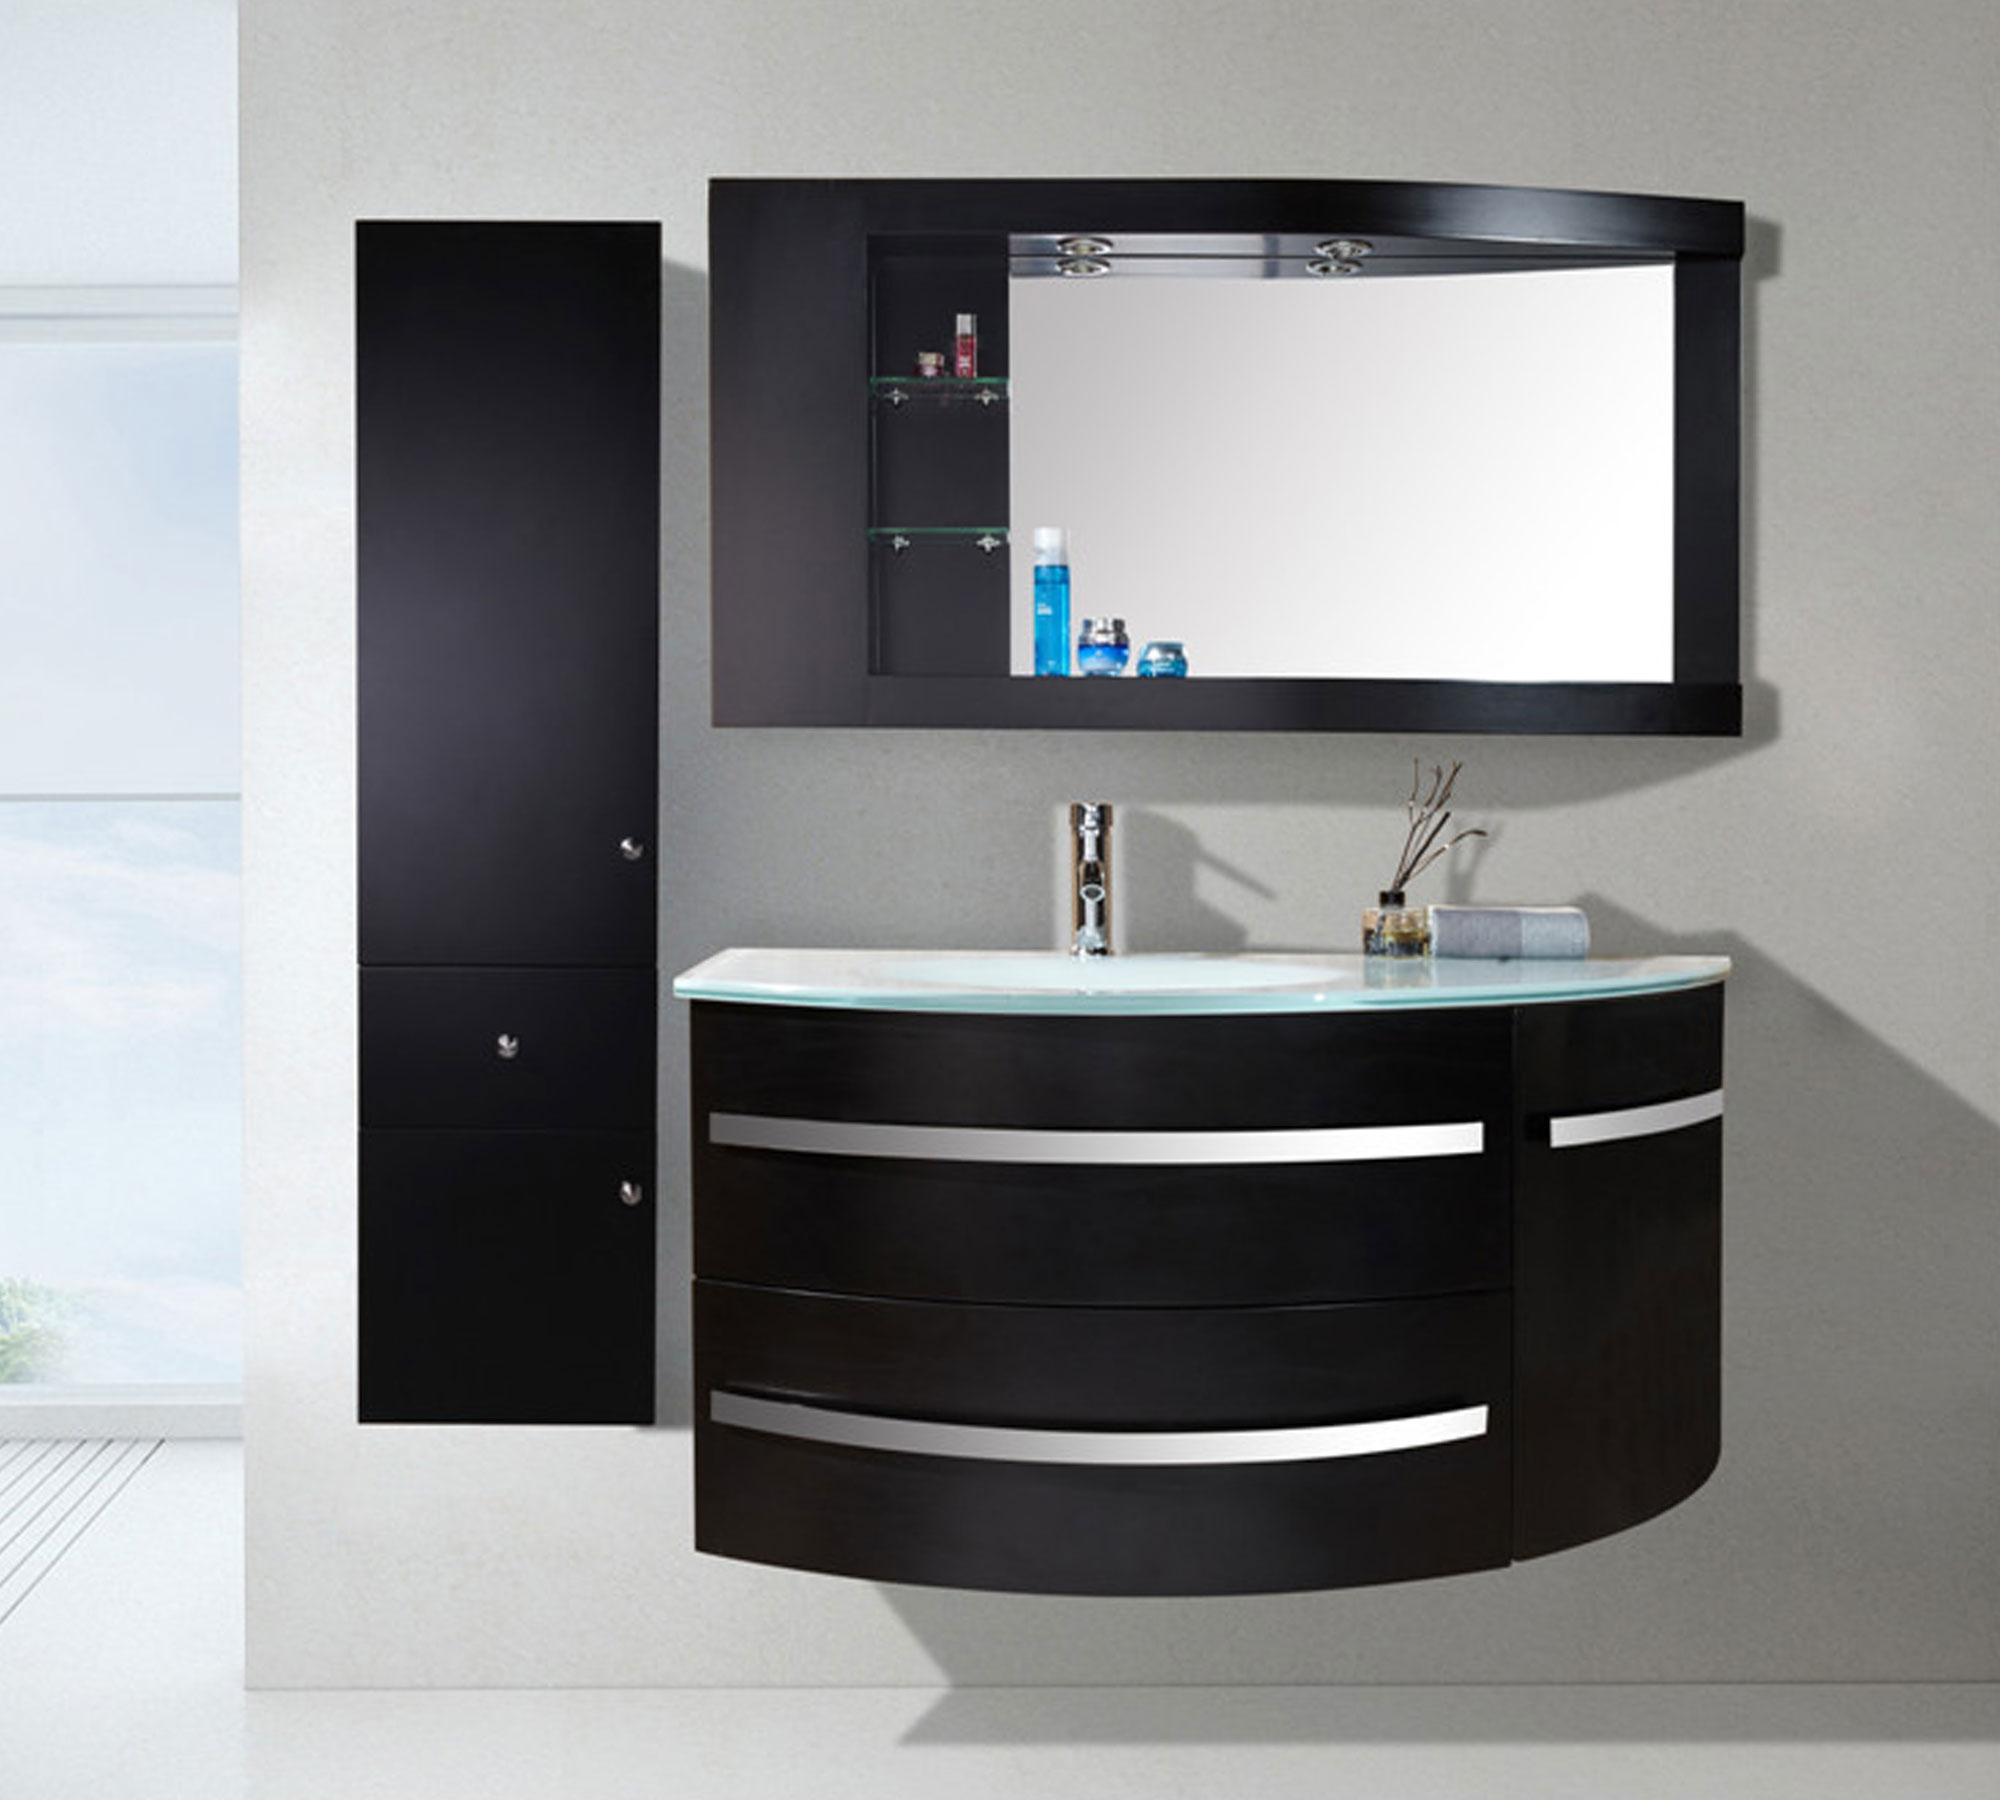 Mobile bagno arredo bagno completo 120 cm lavabo rubinetti - Arredo bagno ebay ...